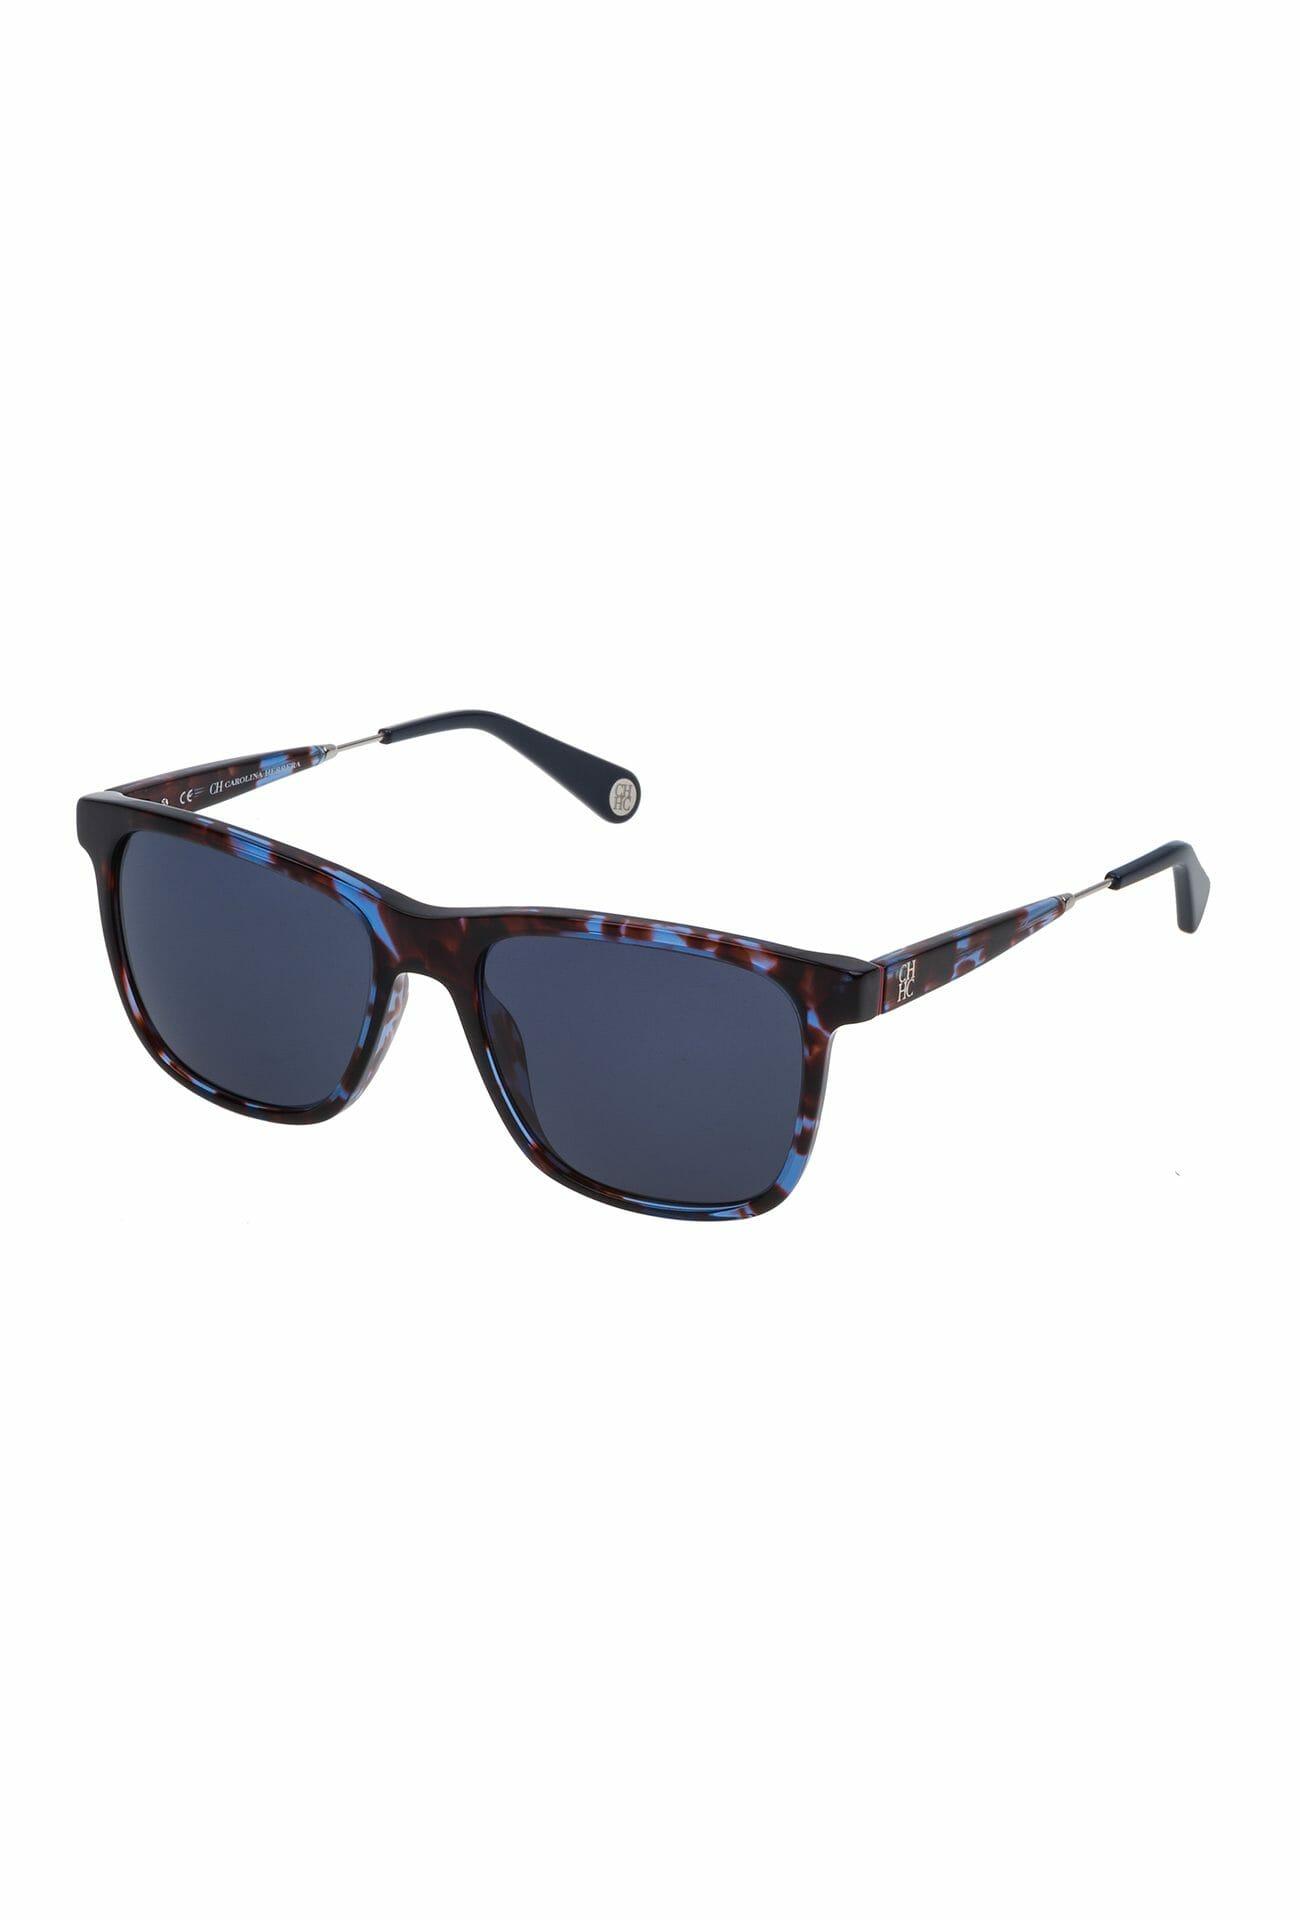 CH-Carolina-Herrera-Eyewear-ReferenceL93-01